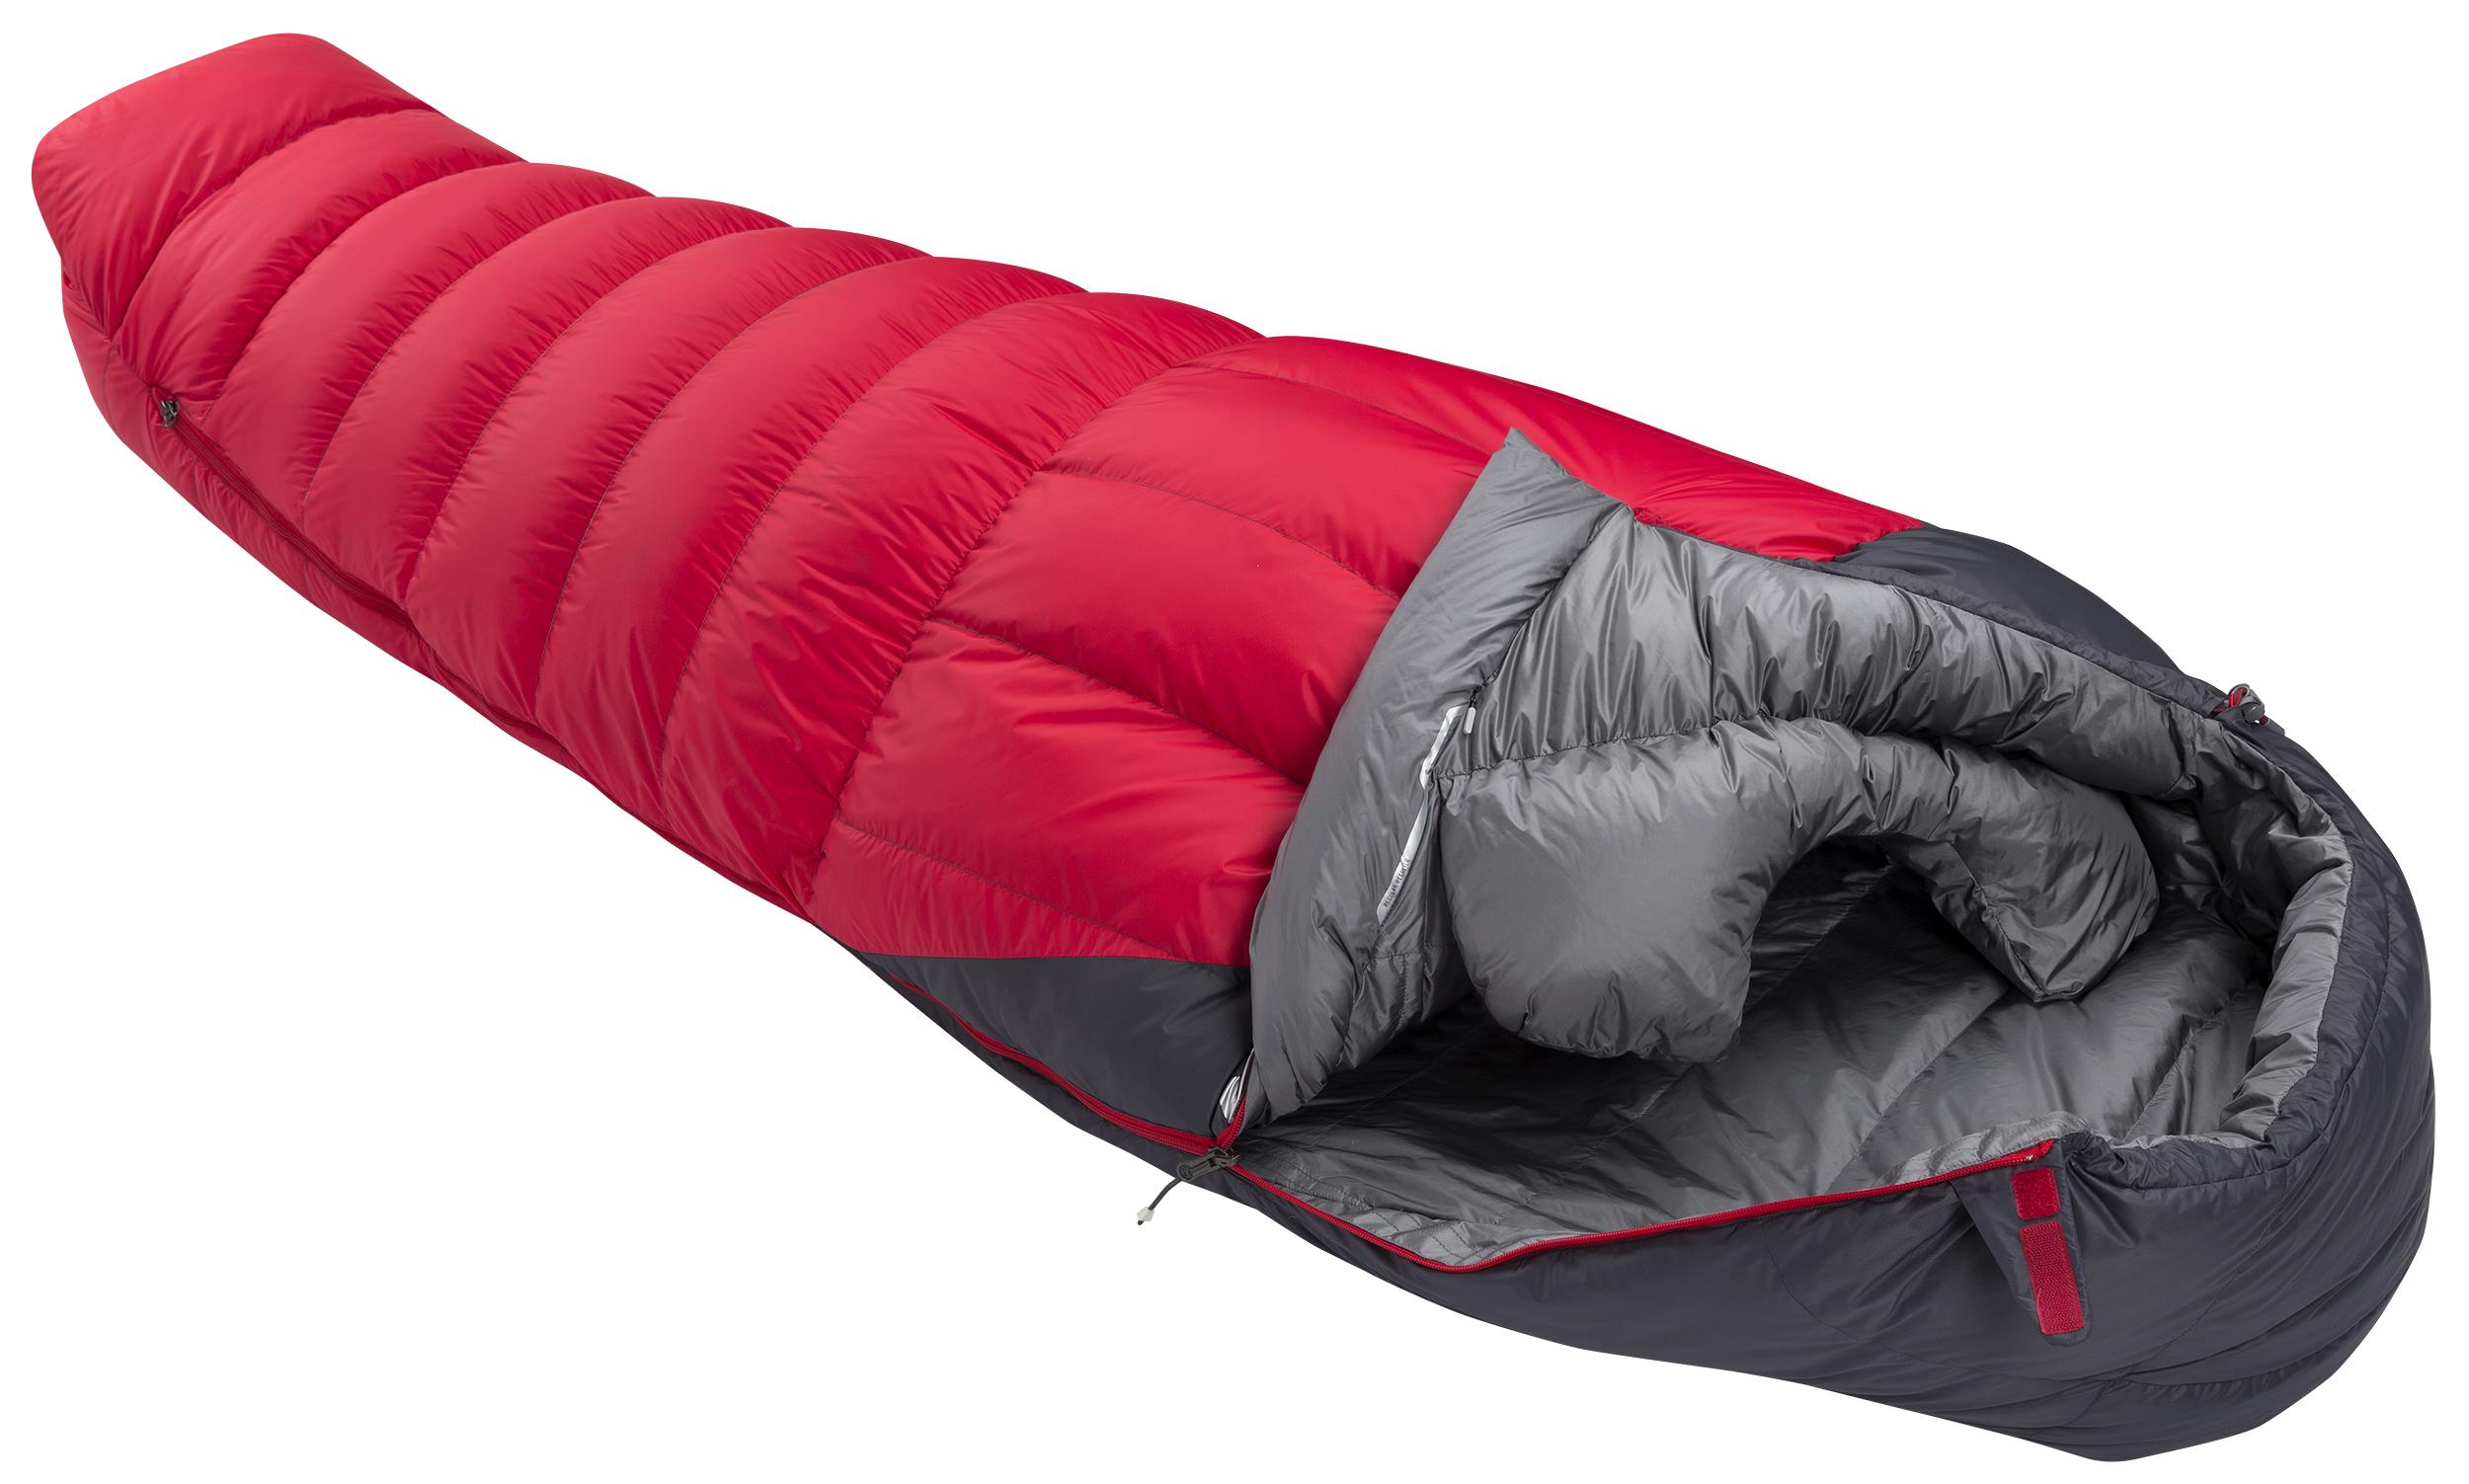 Image result for sleeping bag